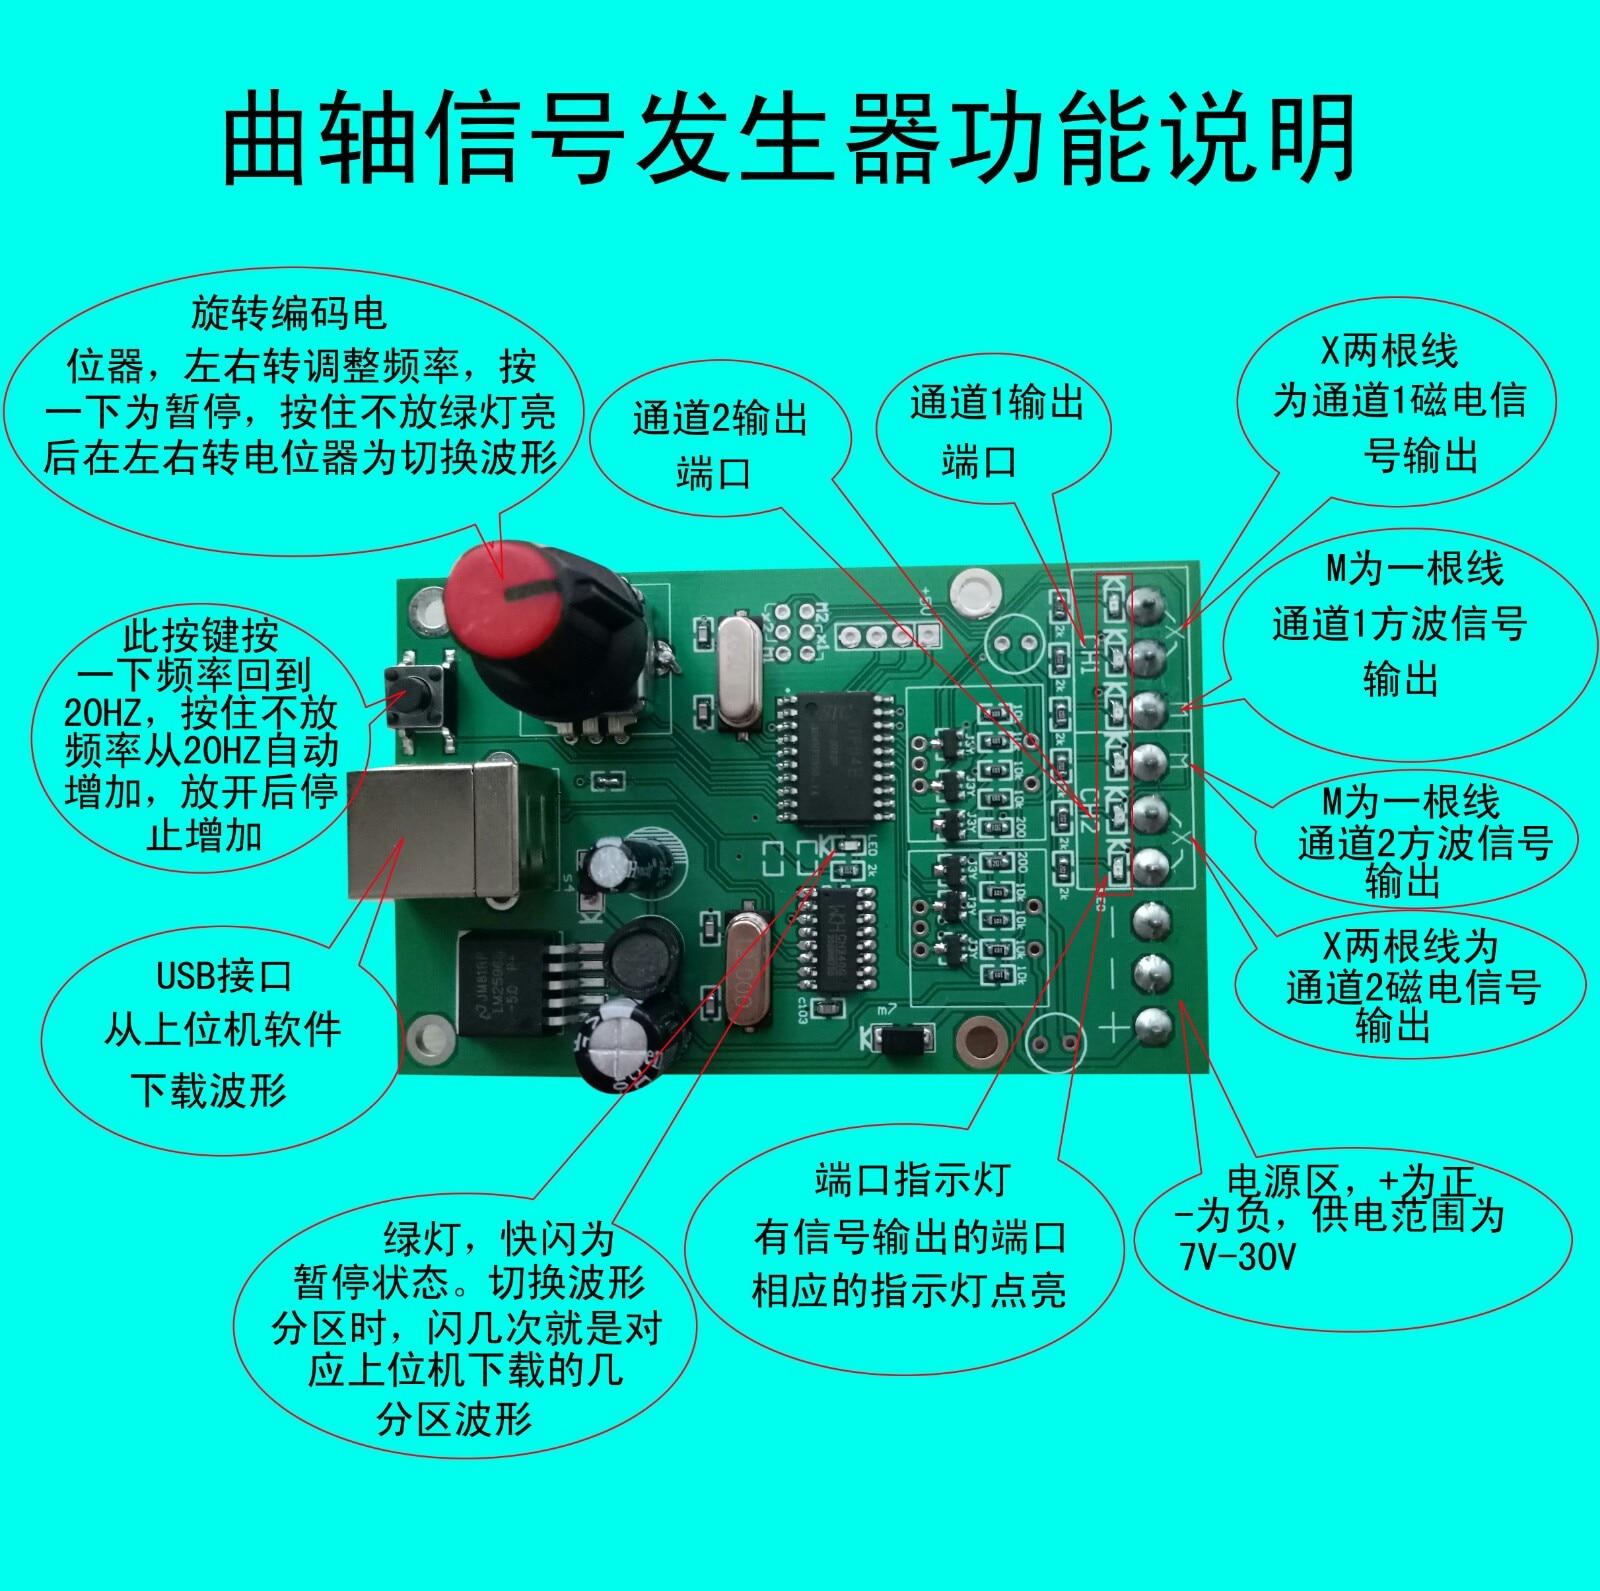 Motor Crankshaft Signal Simulator, Generator